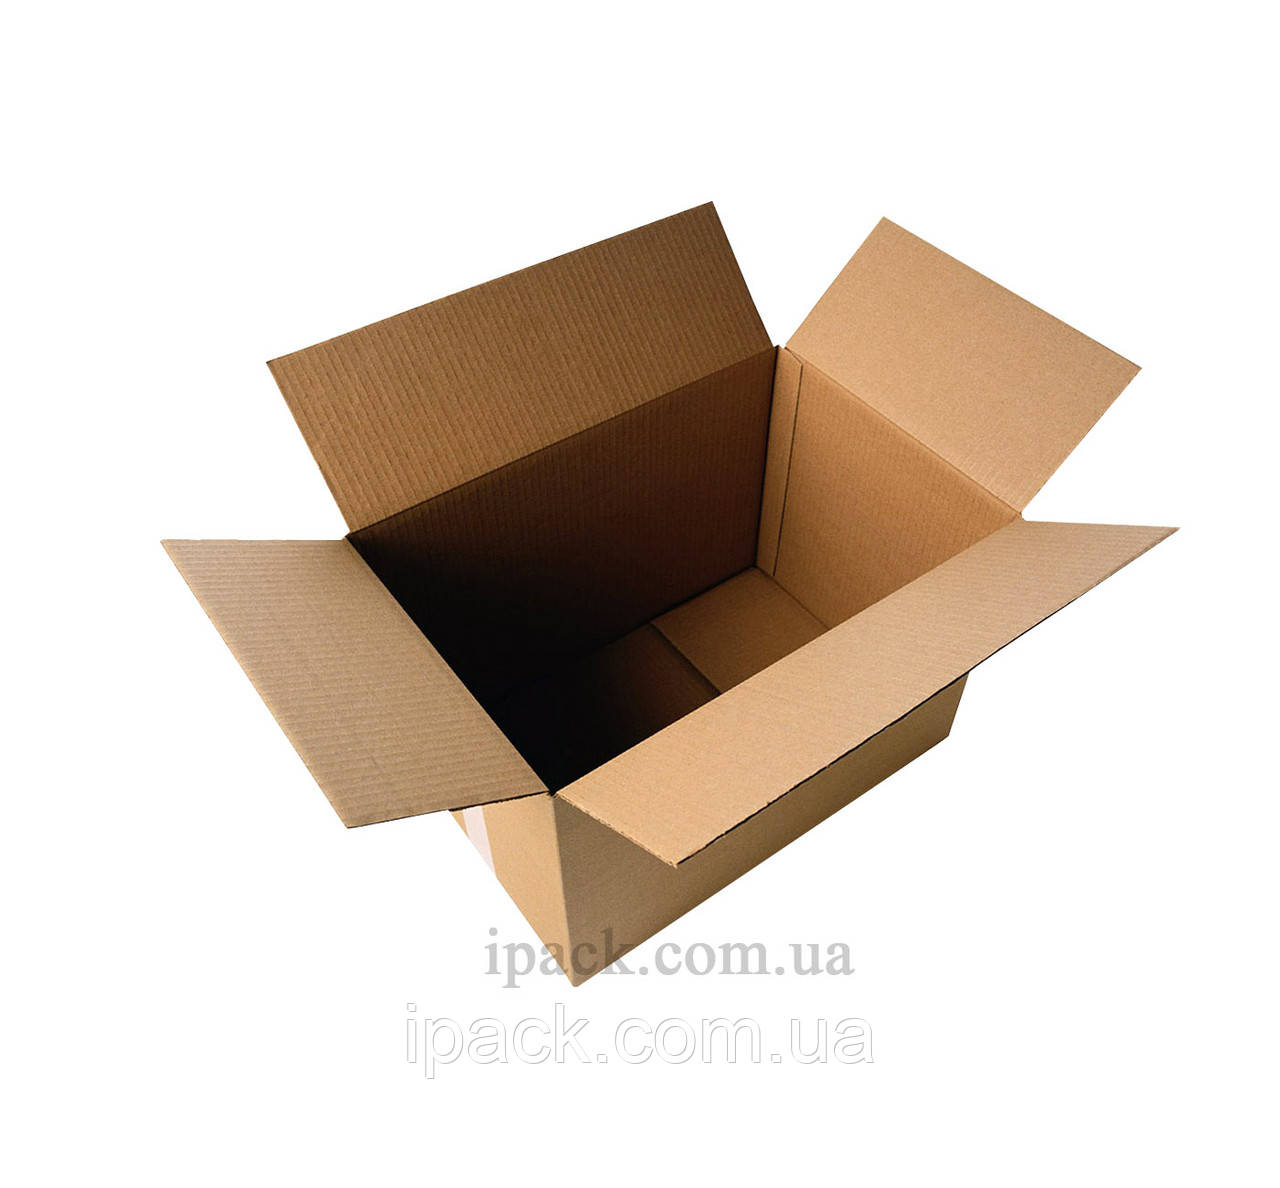 Гофроящик 305*305*505 мм, бурый, четырехклапанный картонный короб